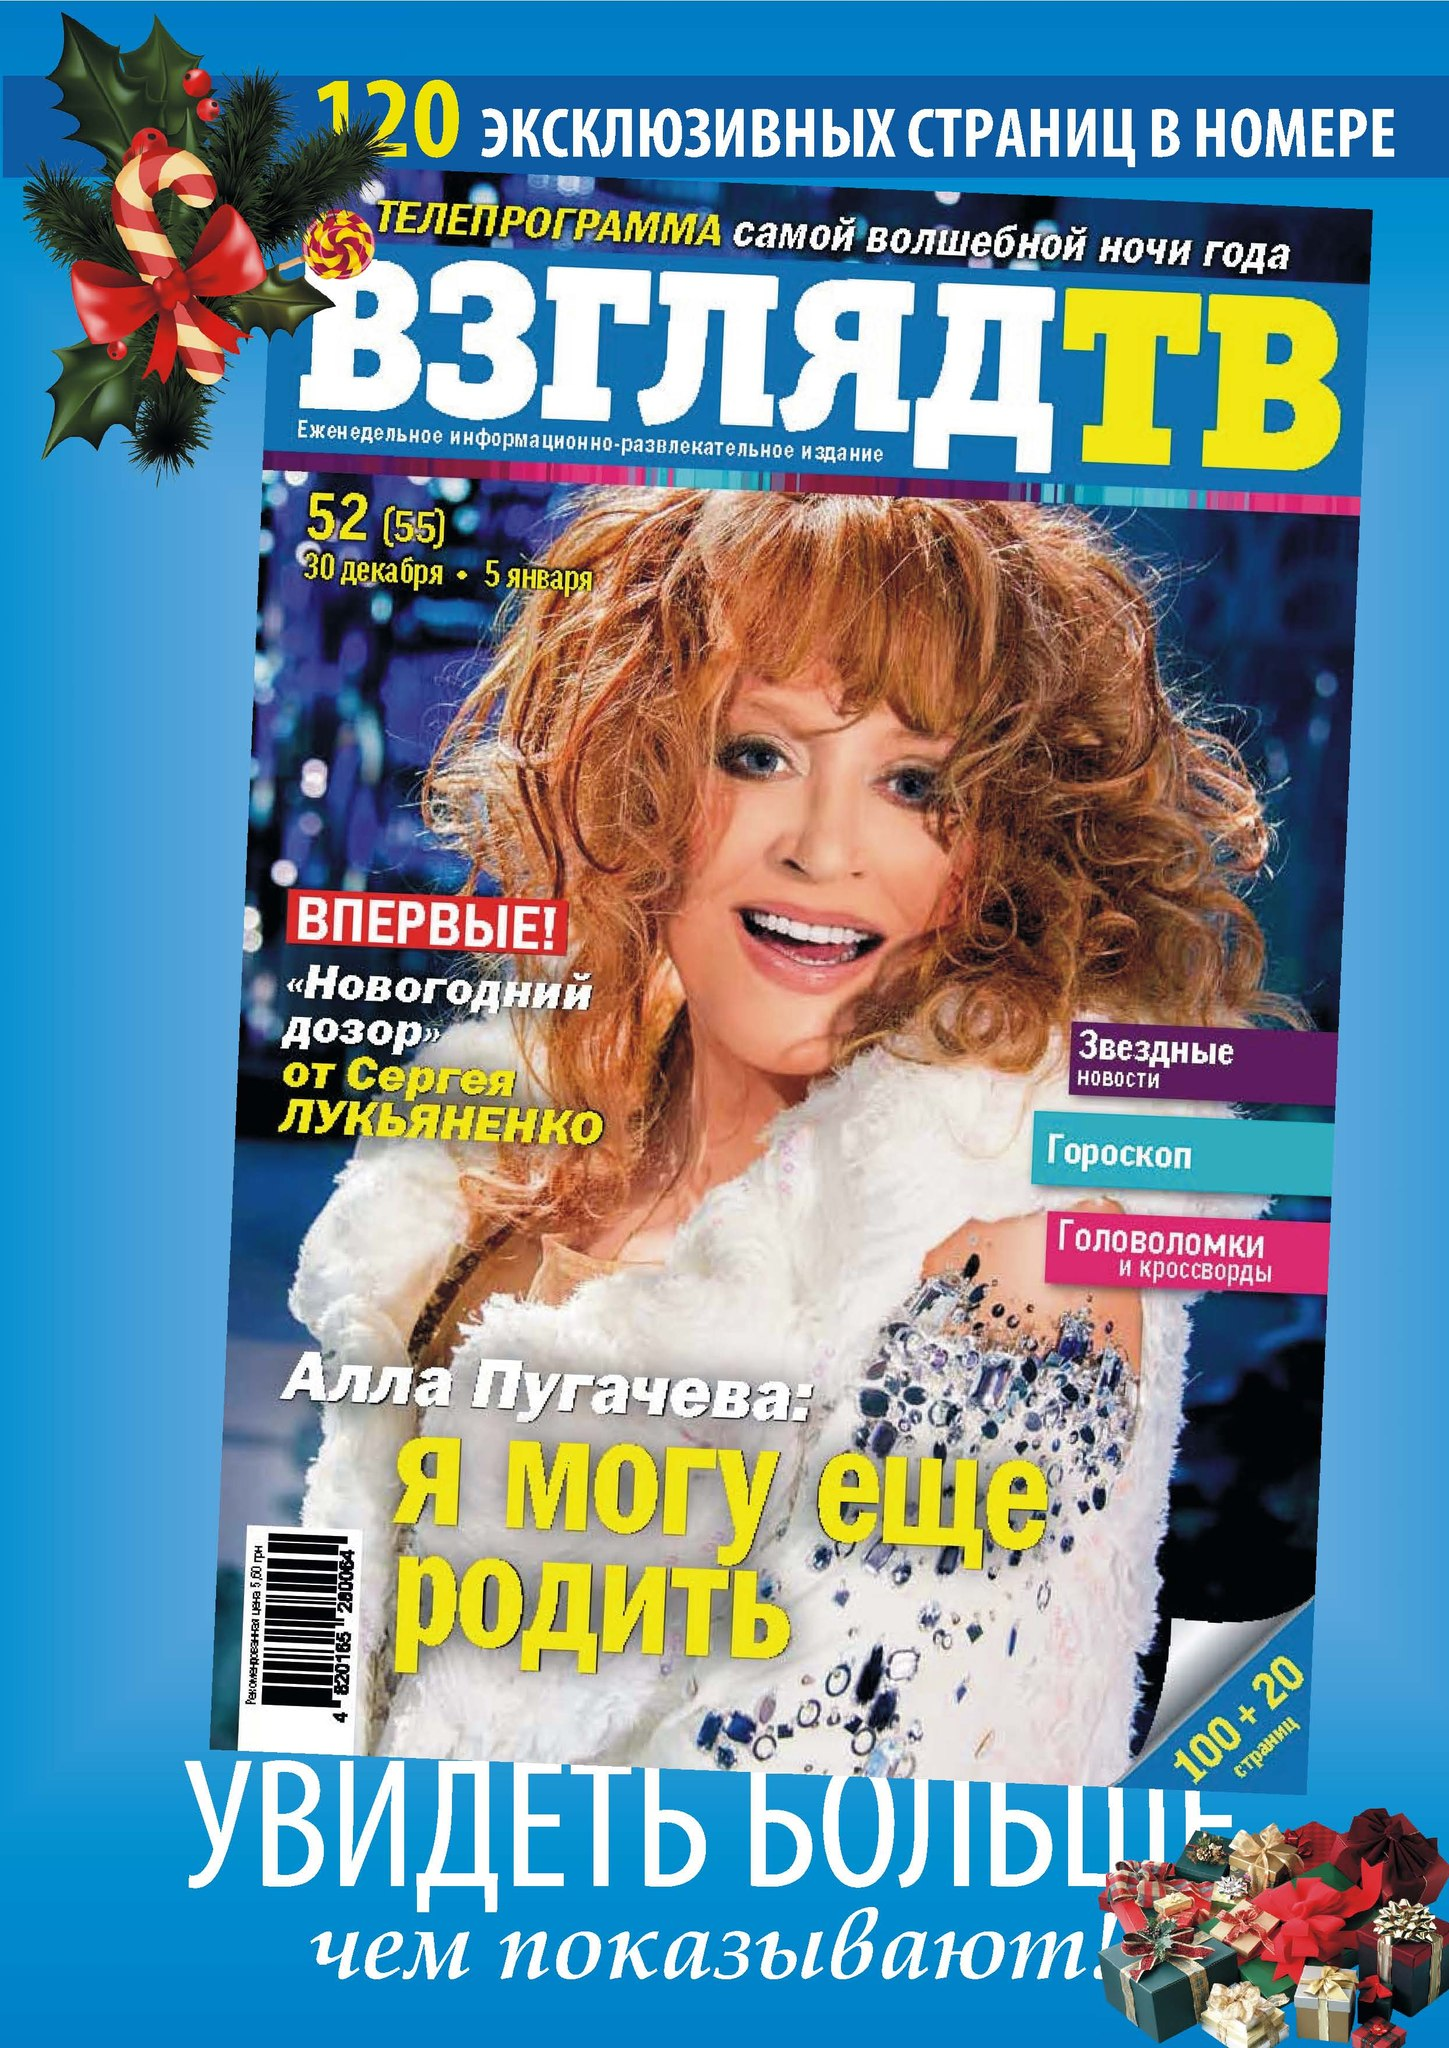 http://s6.uploads.ru/uCqhI.jpg